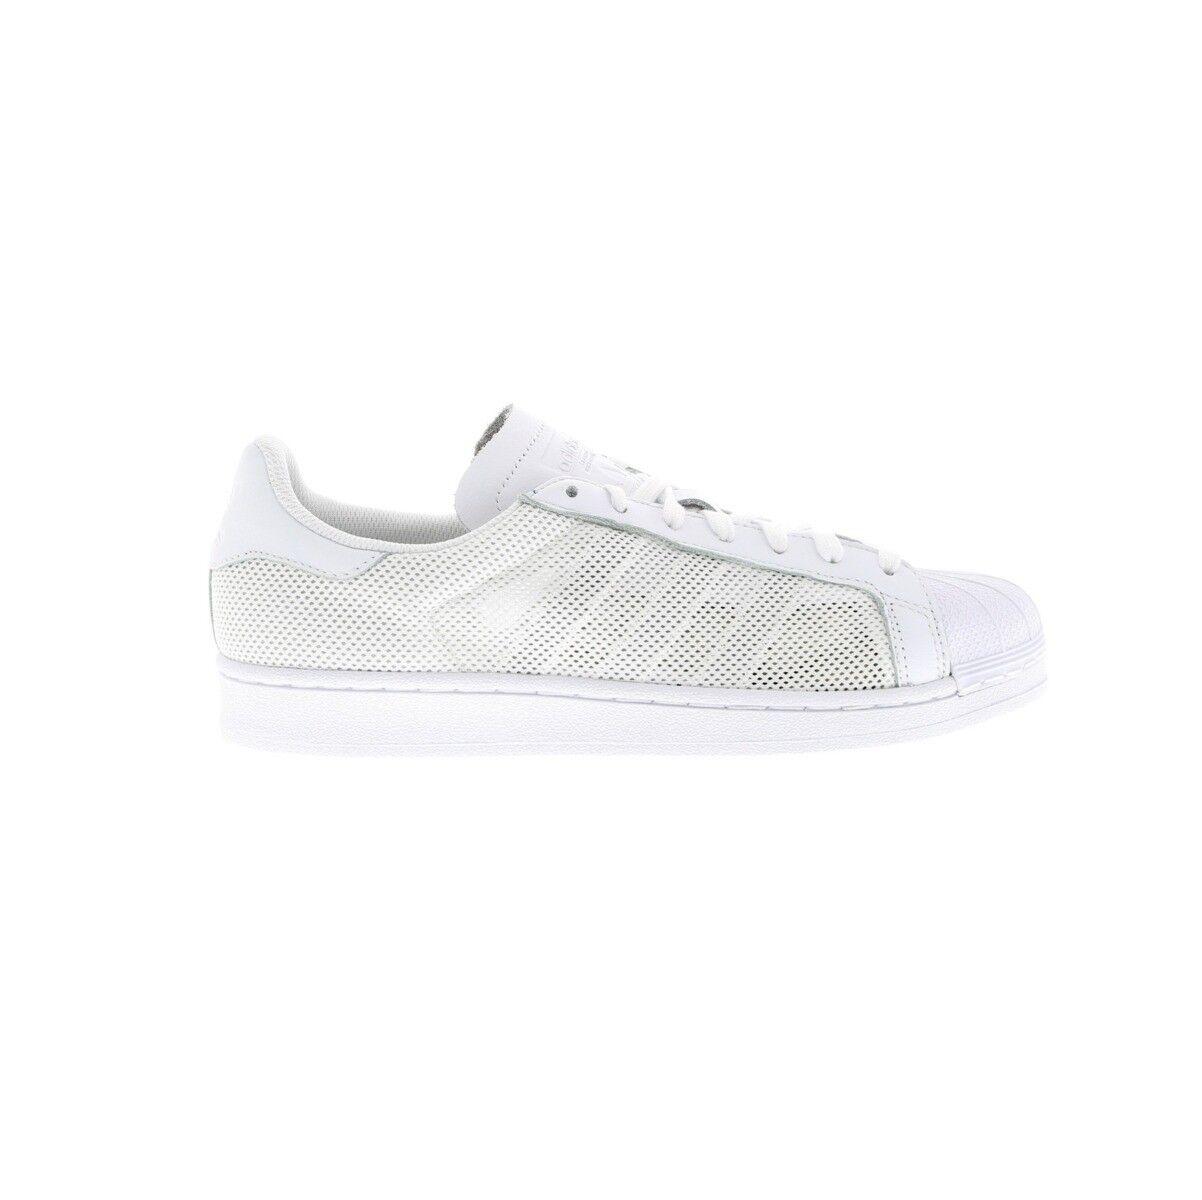 adidas Originals Superstar dreifach size Schuhe CGRANI turnschuhe uk size dreifach 6.5 - 10.5 aca2f1